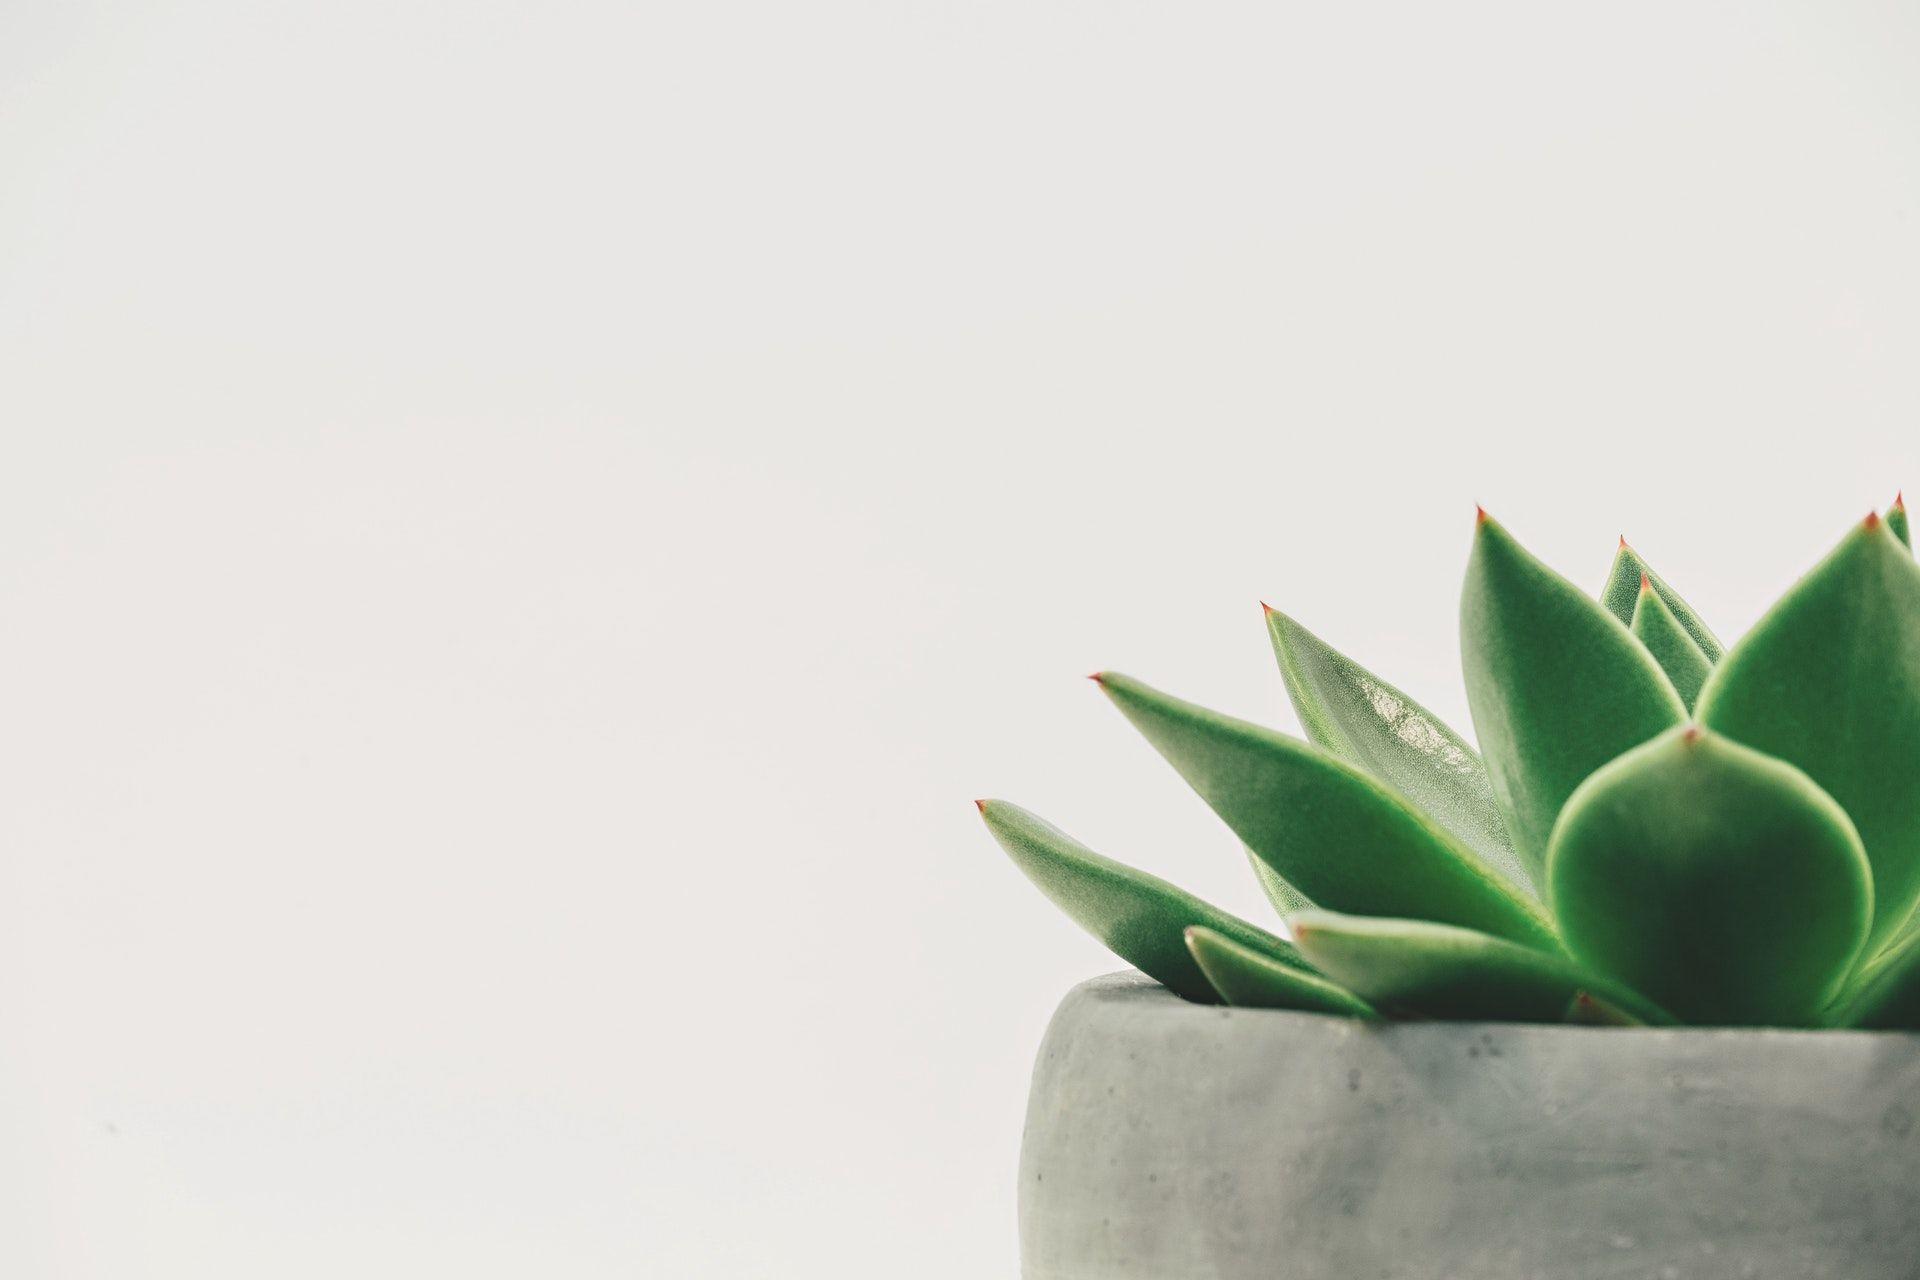 عکس زمینه گیاه شاداب در گلدان پس زمینه